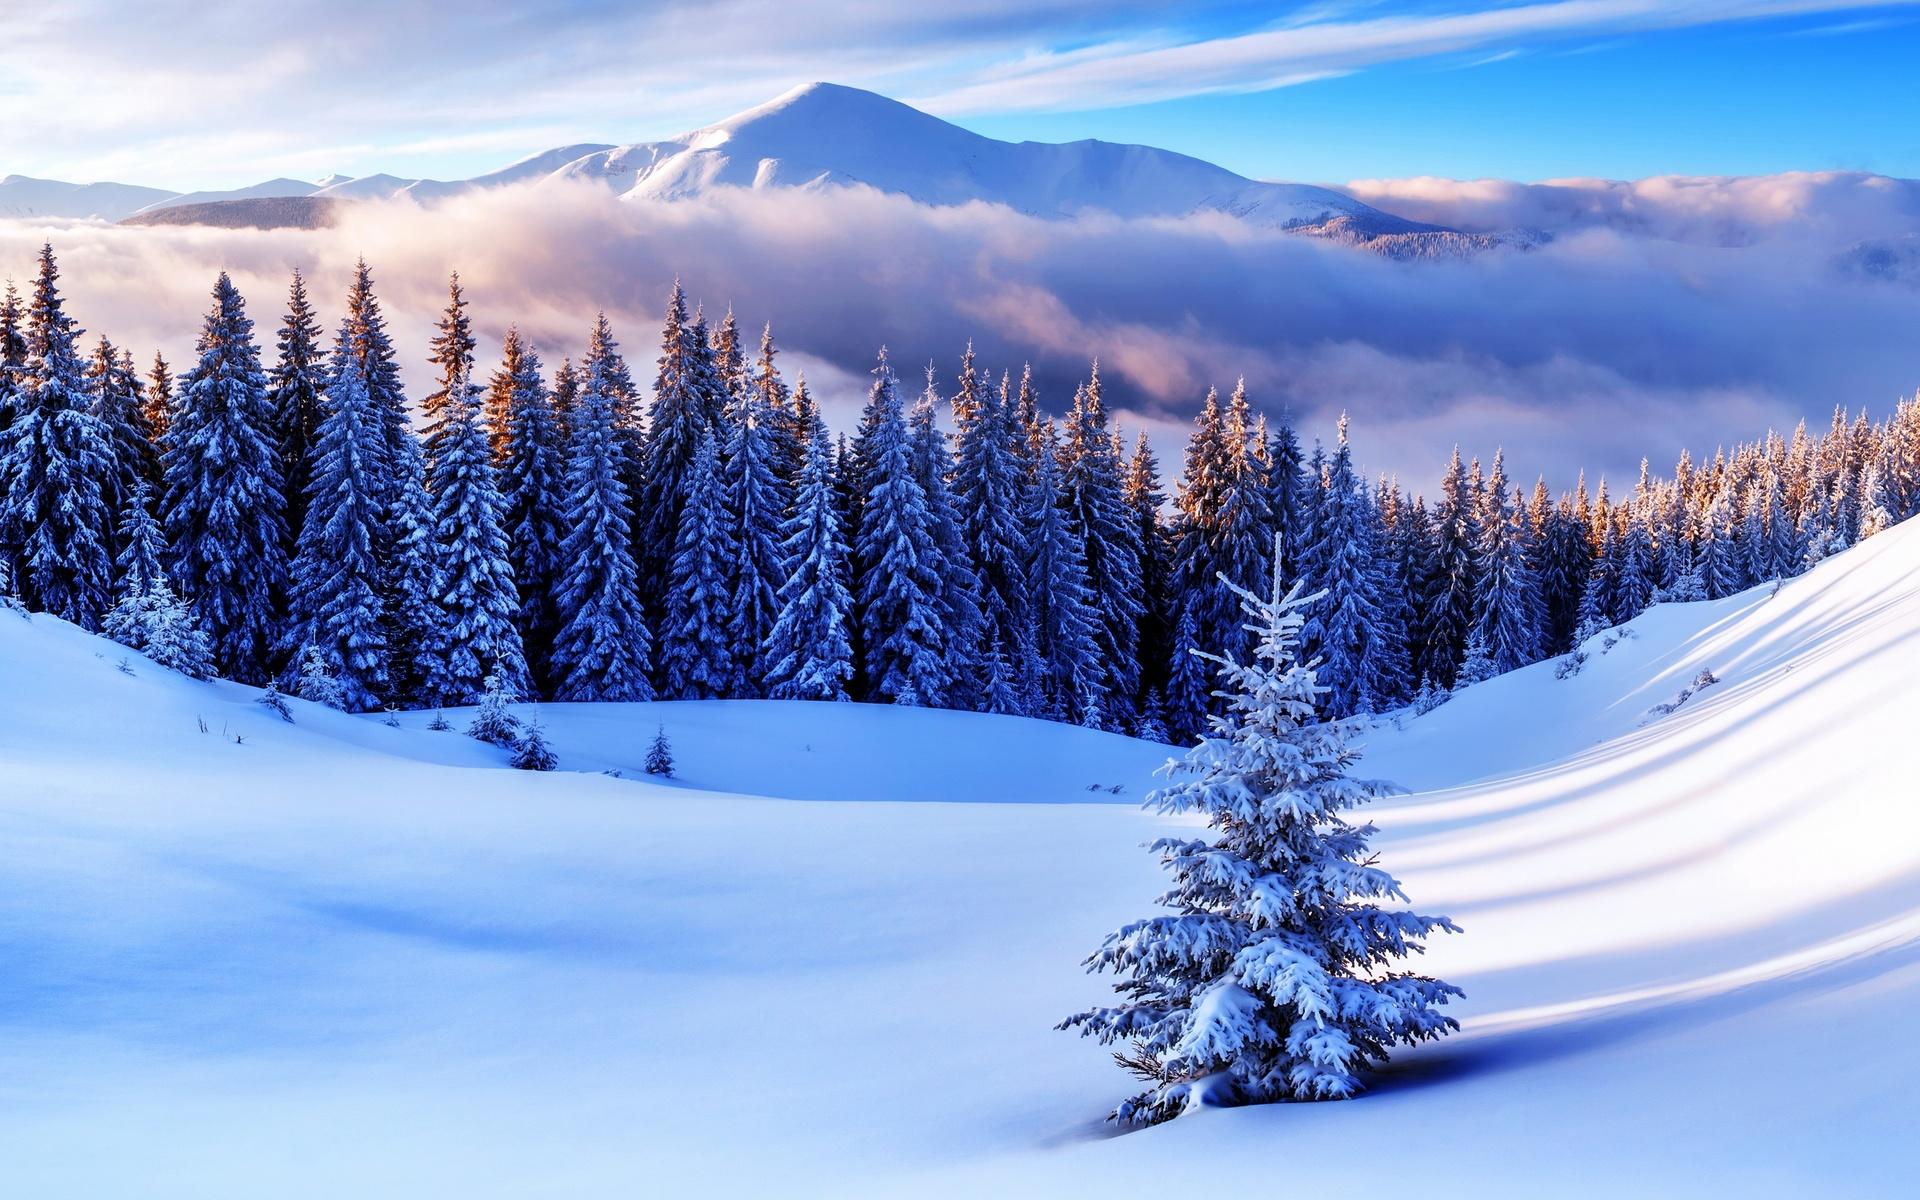 фото бои зима картинки была